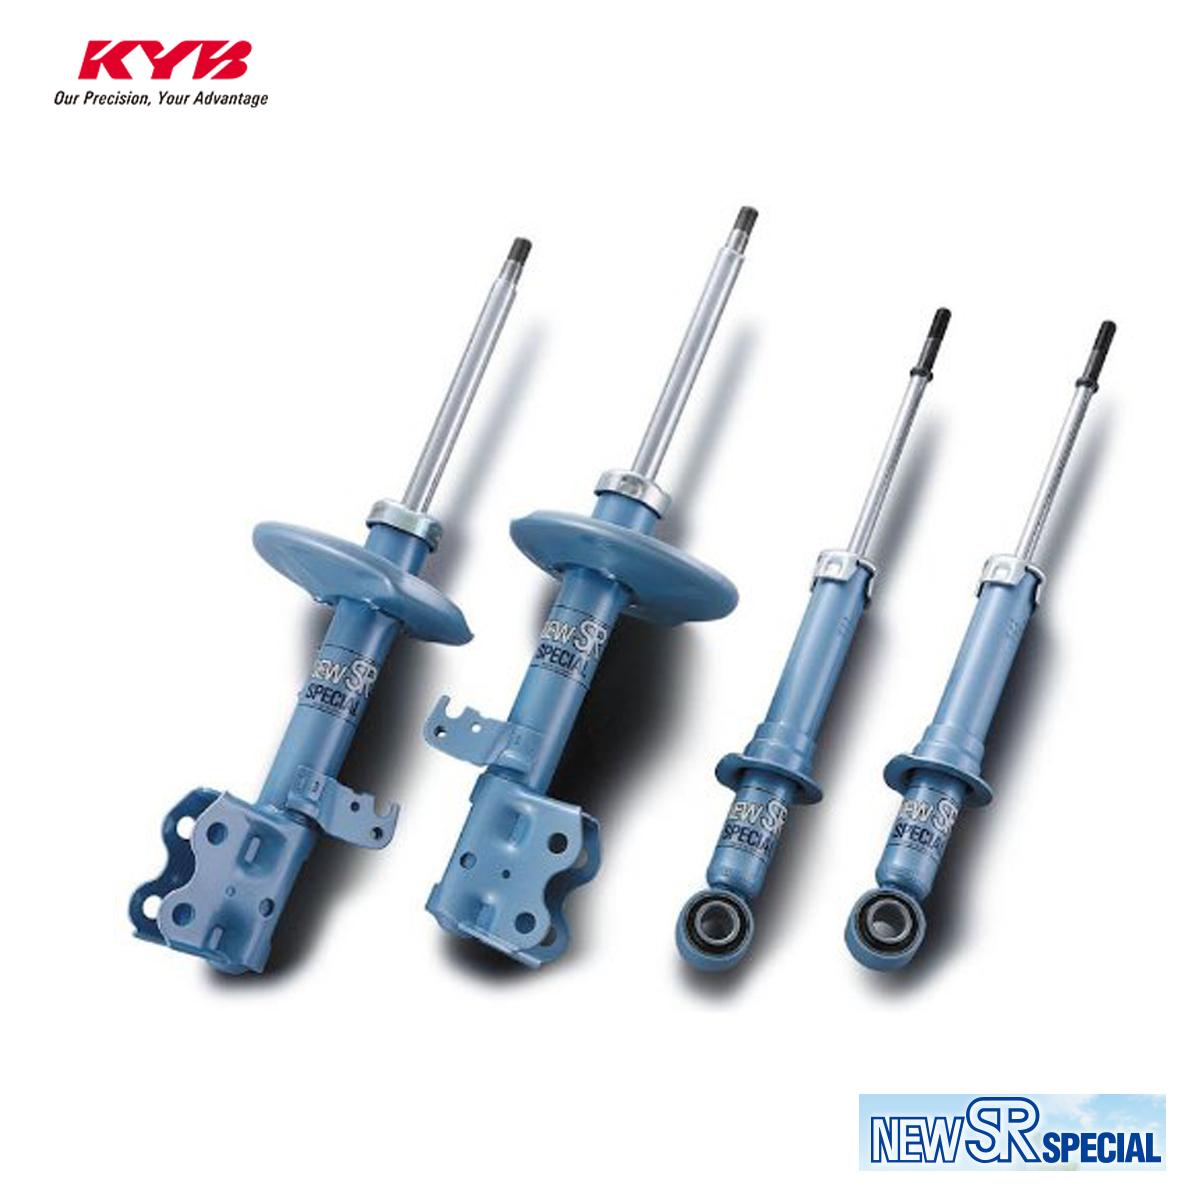 KYB カヤバ CX-5 KEEAW ショックアブソーバー 1台分 NEW SR SPECIAL NS-55852158 配送先条件有り